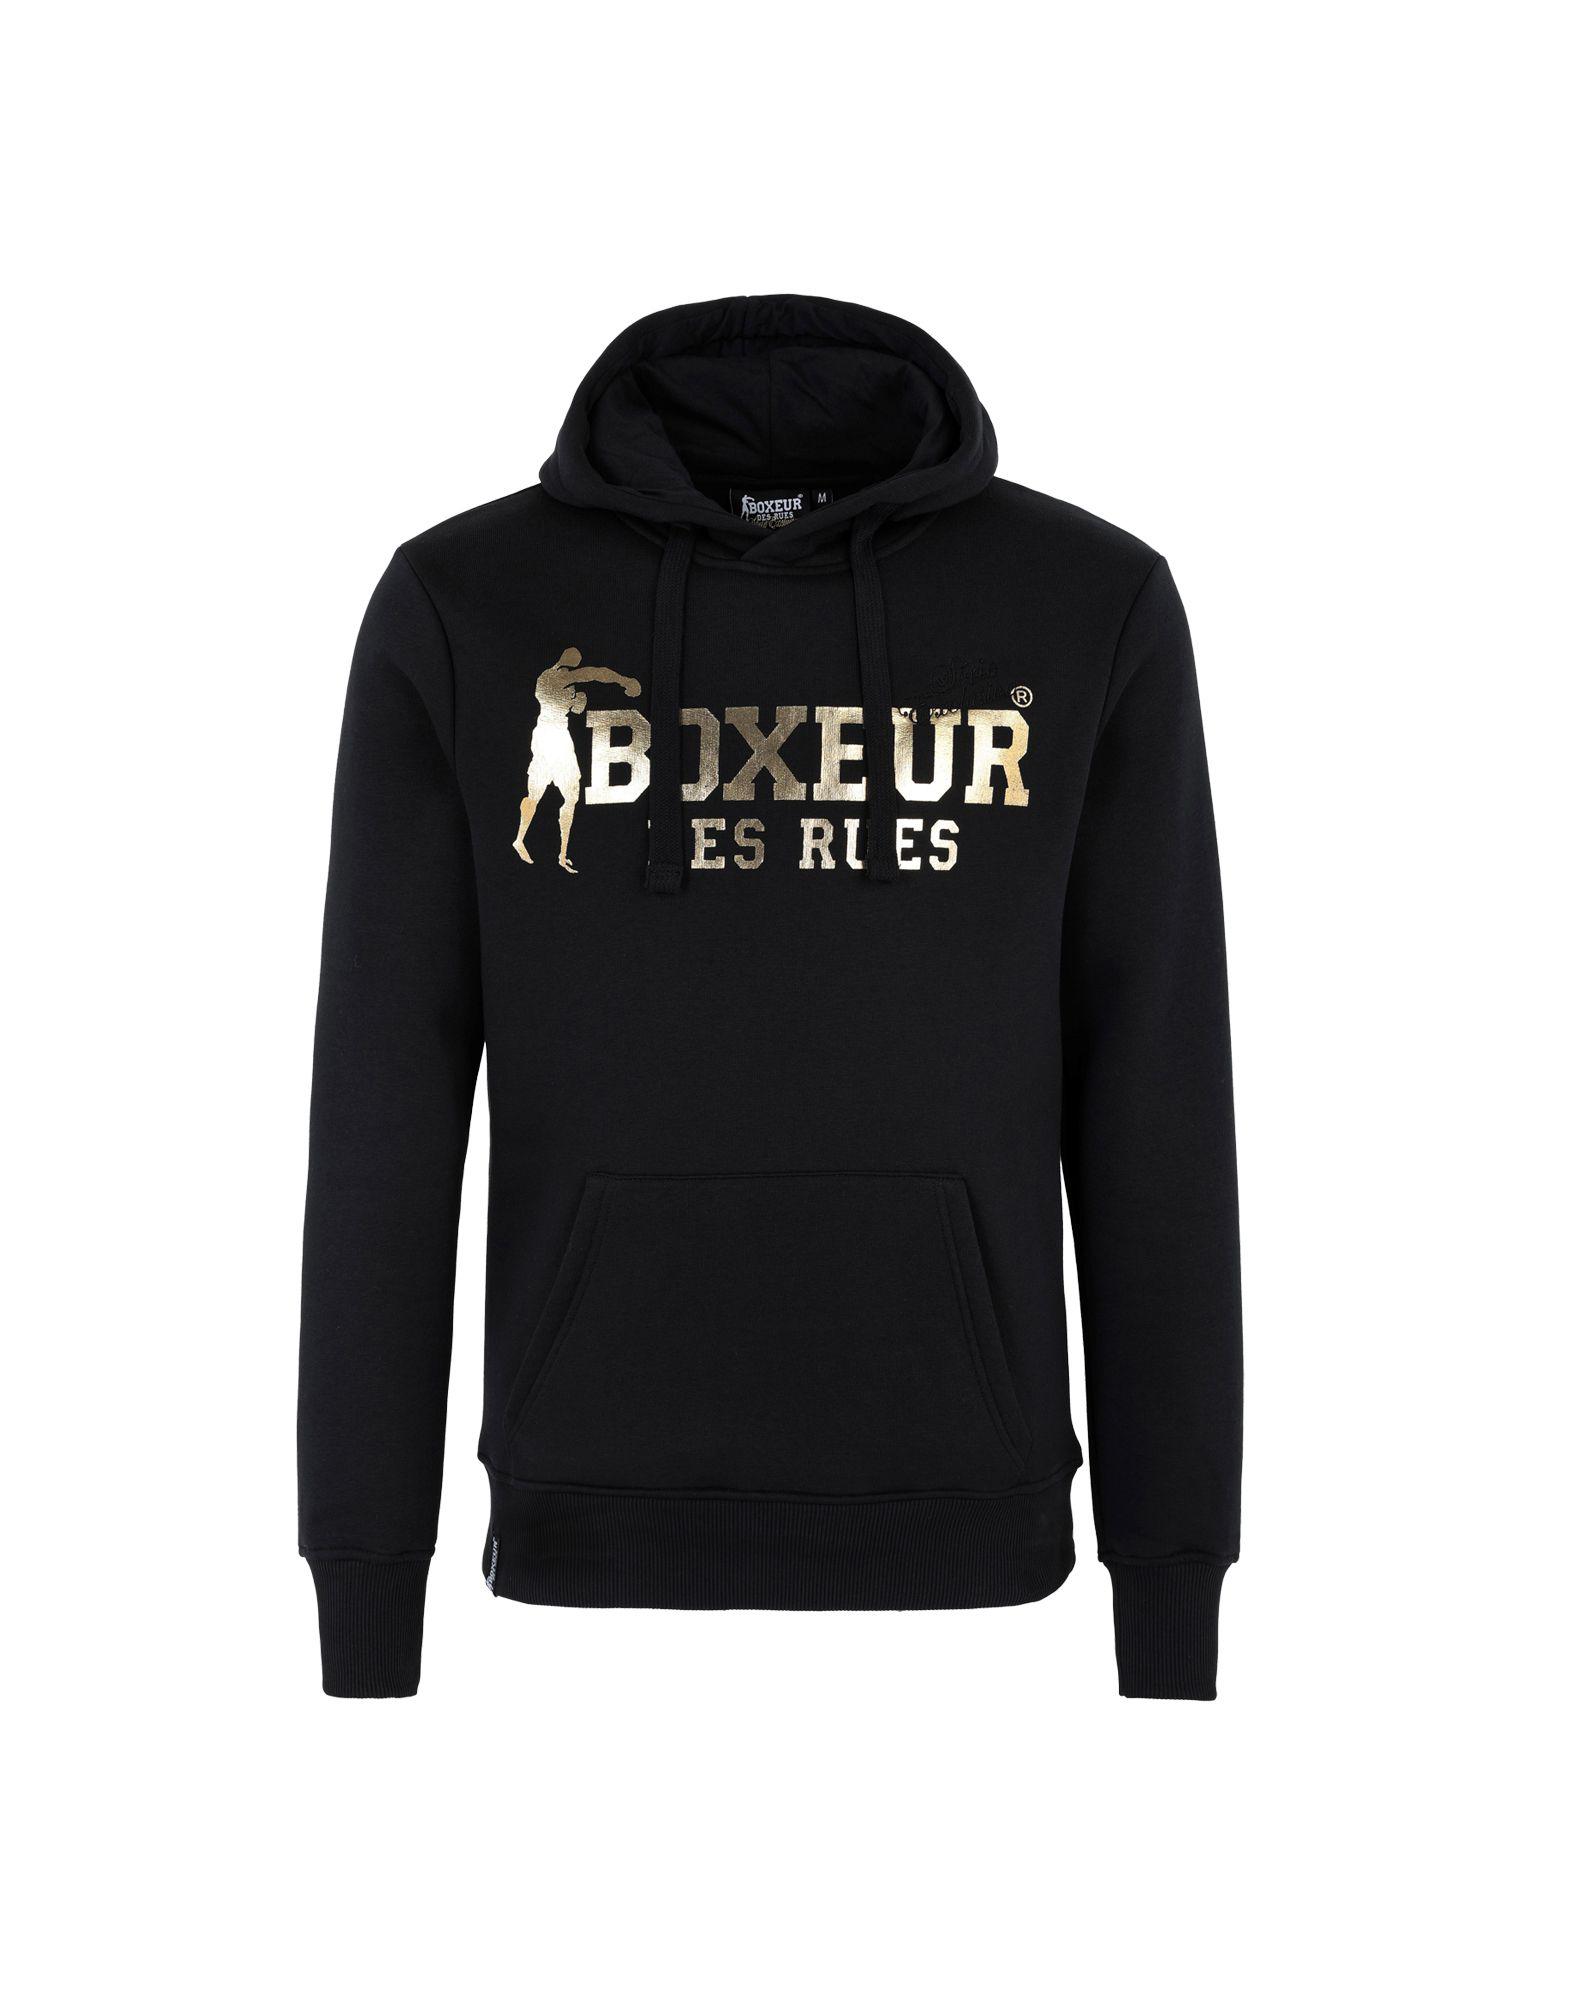 Black T-Shirt with Raglan Sleeves Man Boxeur Des Rues